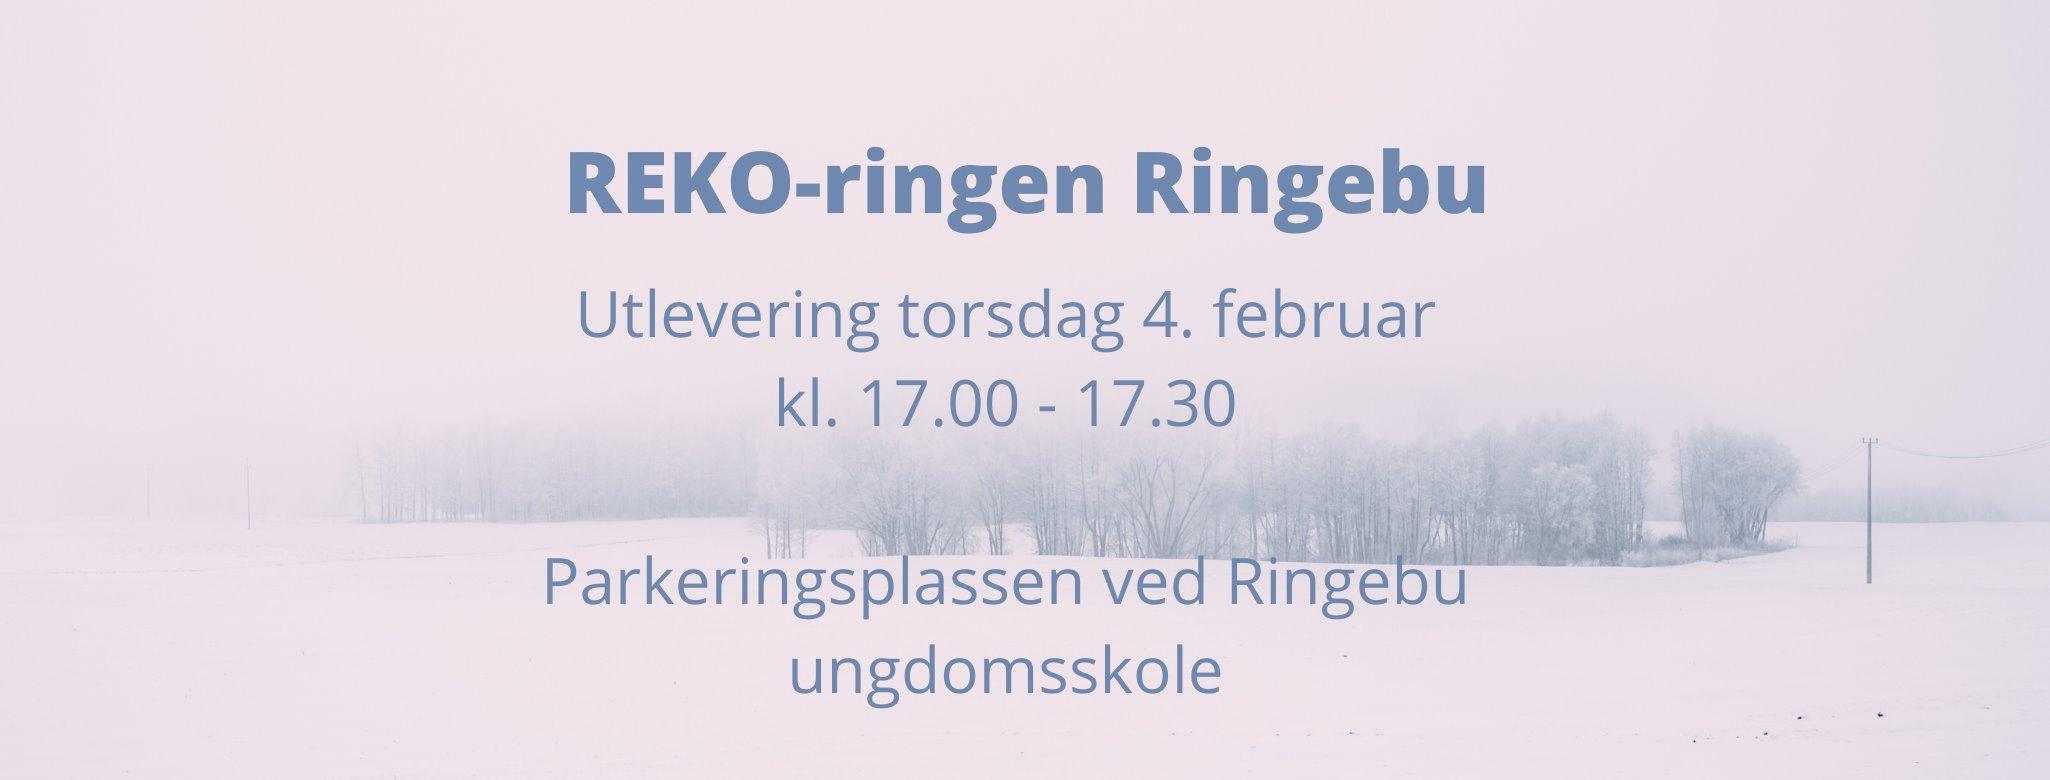 Nytt tidspunkt for utlevering i REKO-ringen Ringebu